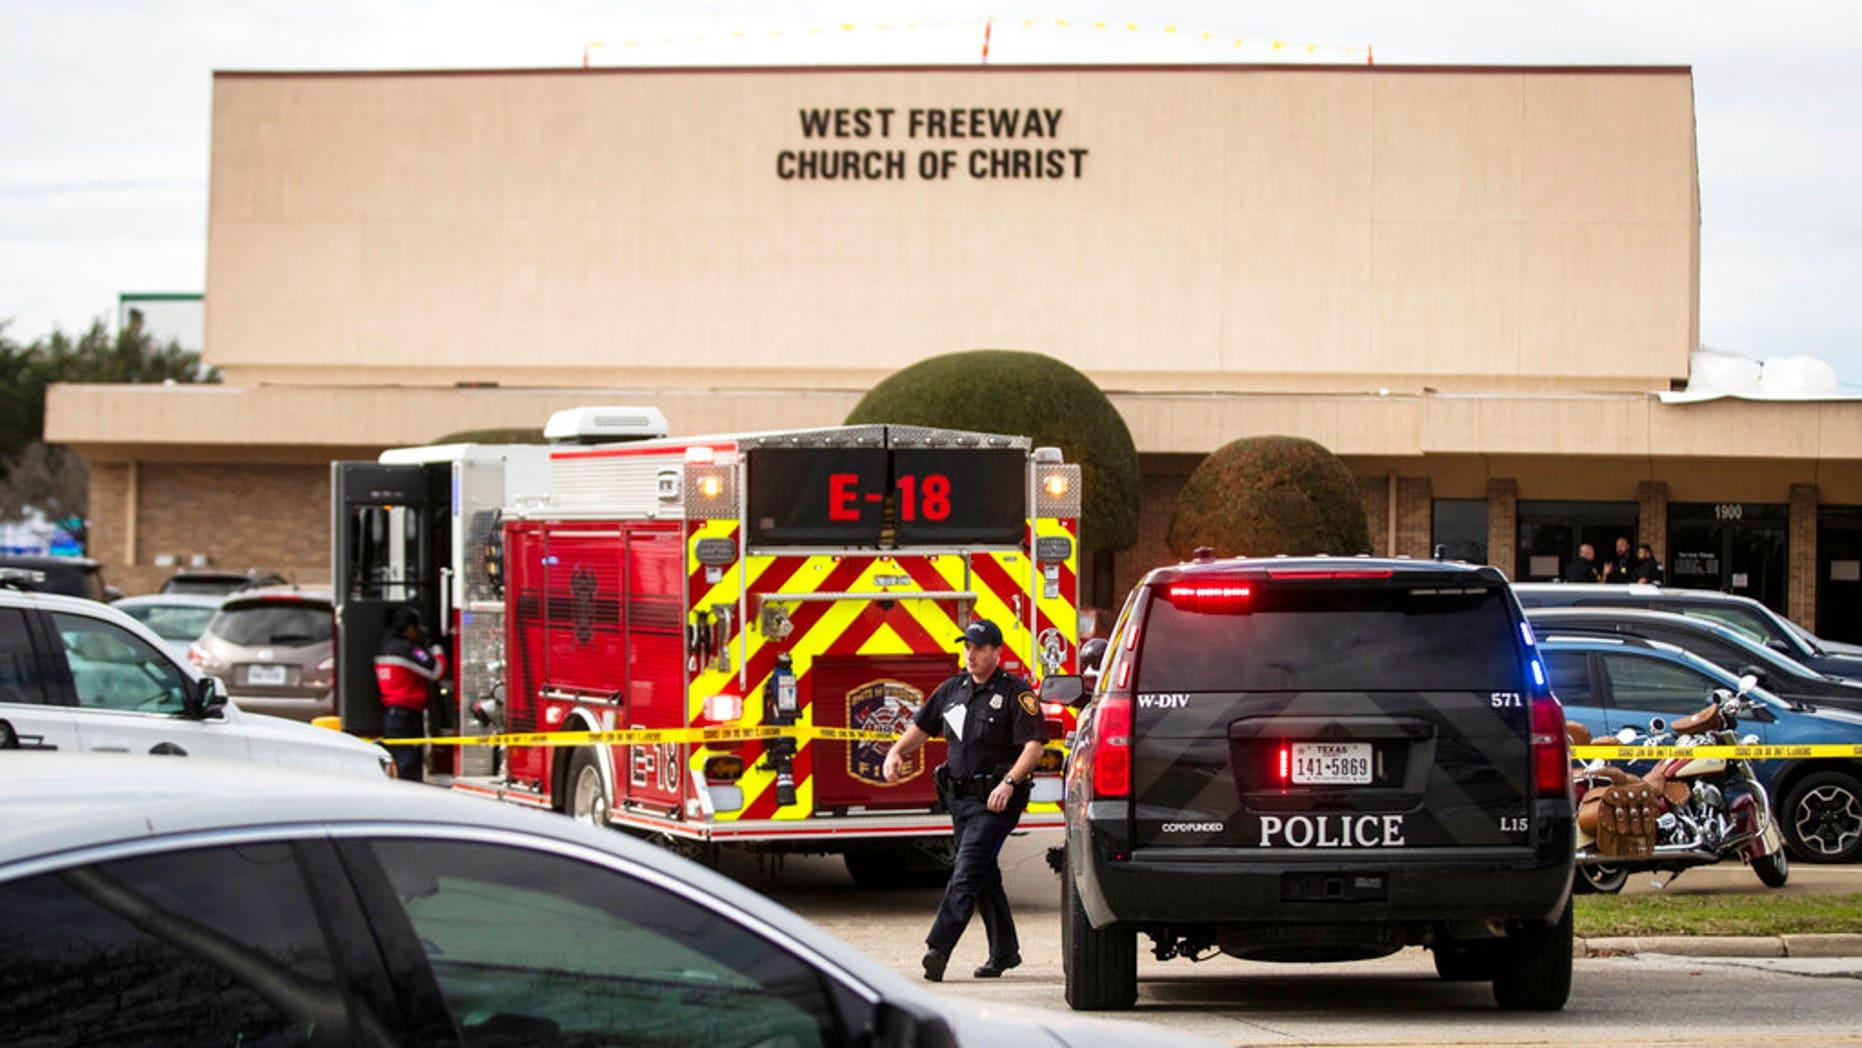 Westlake Legal Group AP19364053768672 Gunman opens fire in Texas church, killing 2; 'heroic' parishioners take down shooter fox-news/columns/fox-news-first fox news fnc/us fnc article 30ec8f12-7169-5f17-b4be-3c688b589028